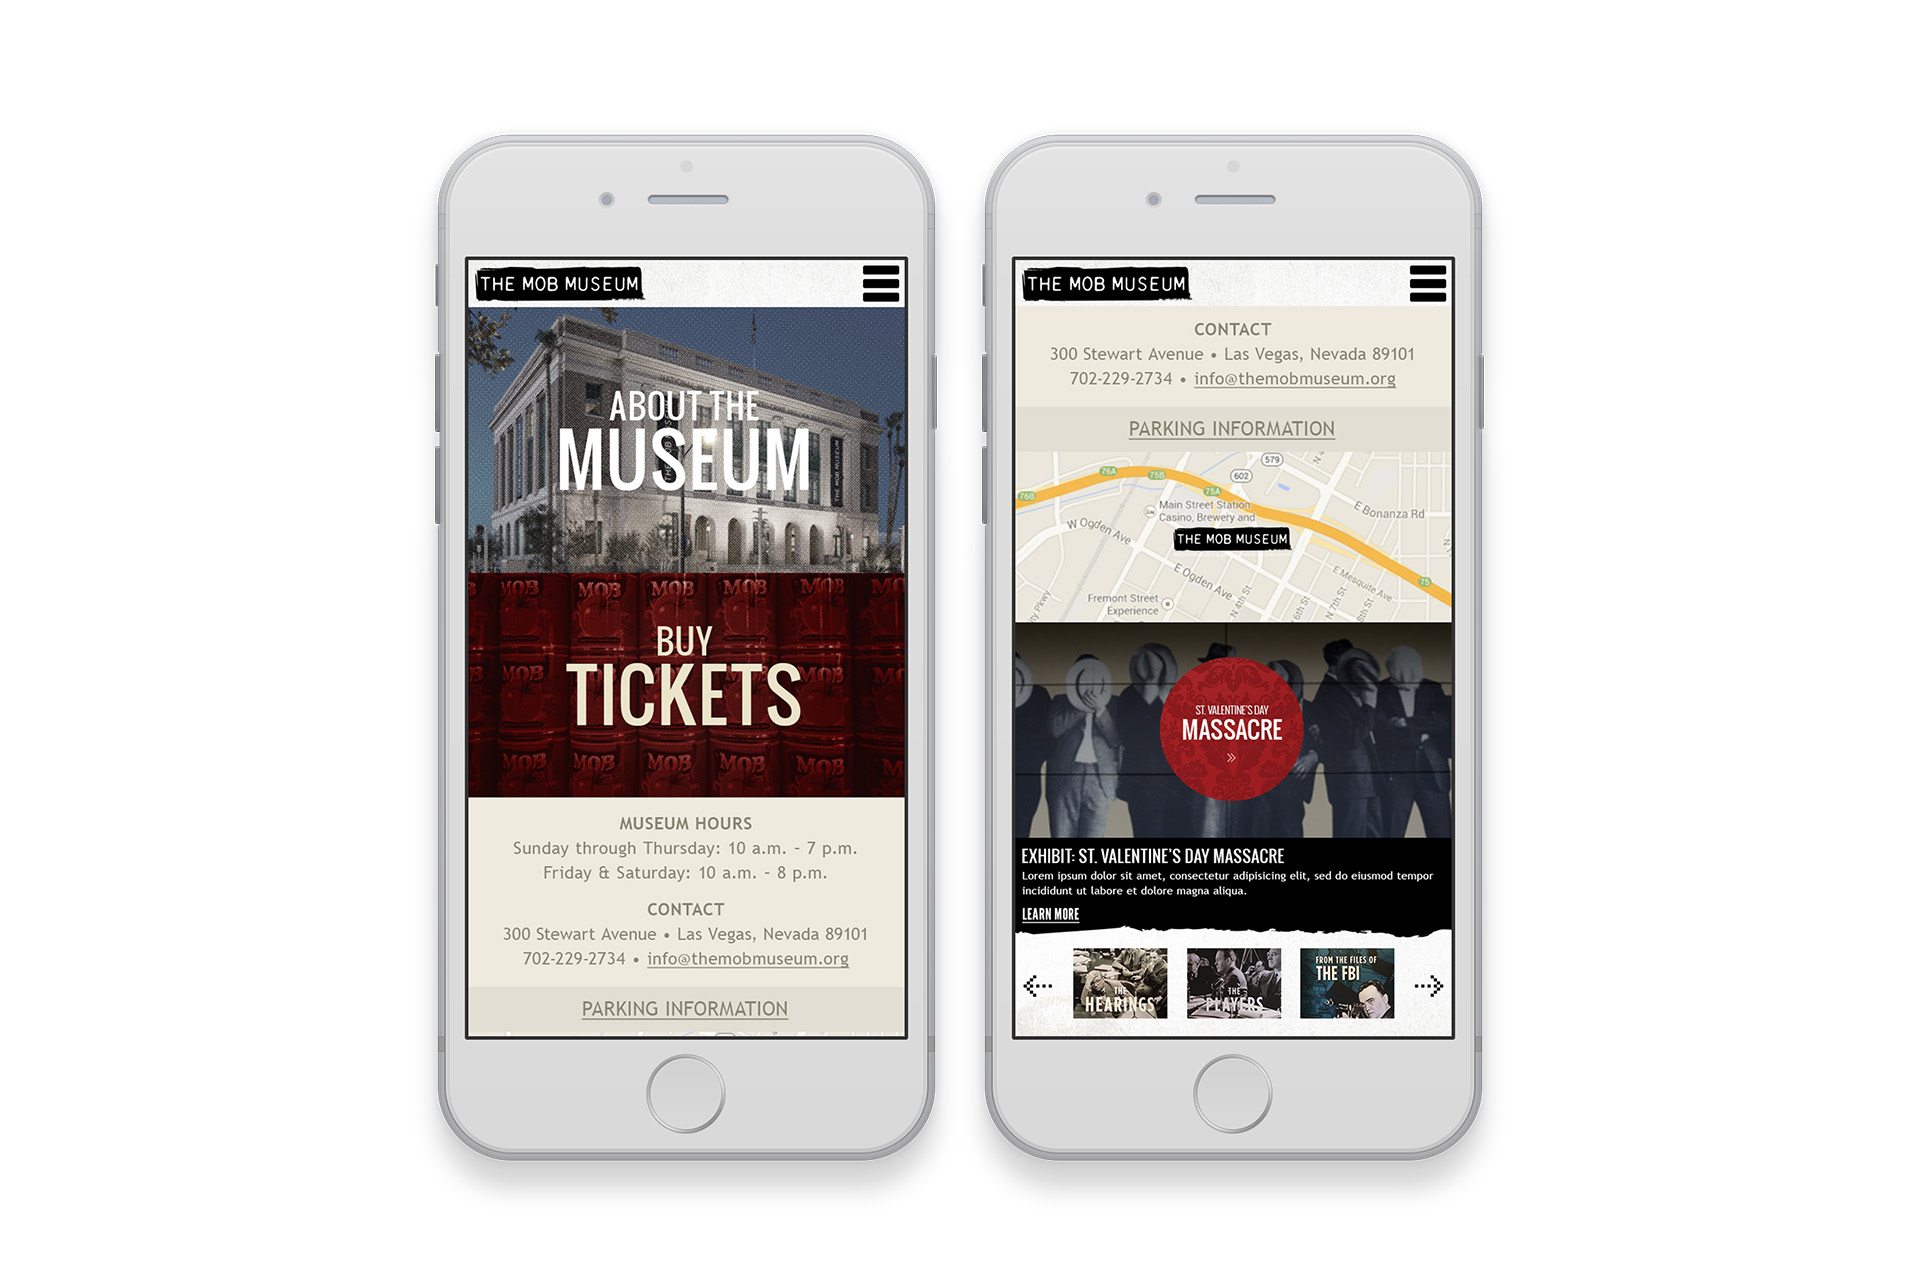 dr-ui-WEB_Mob Museum.jpg